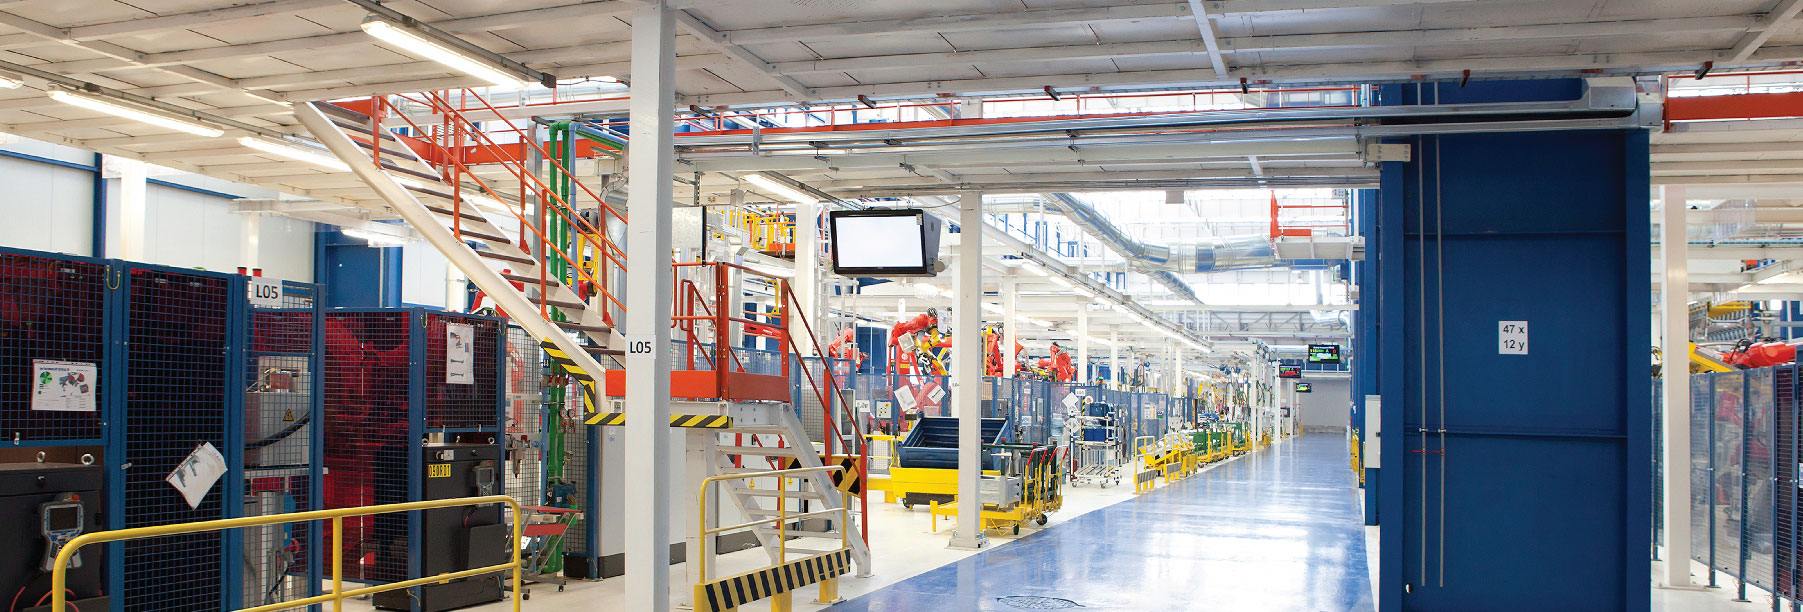 Atronix Engineering, Complete Systems, factory,  atronixengineering.com